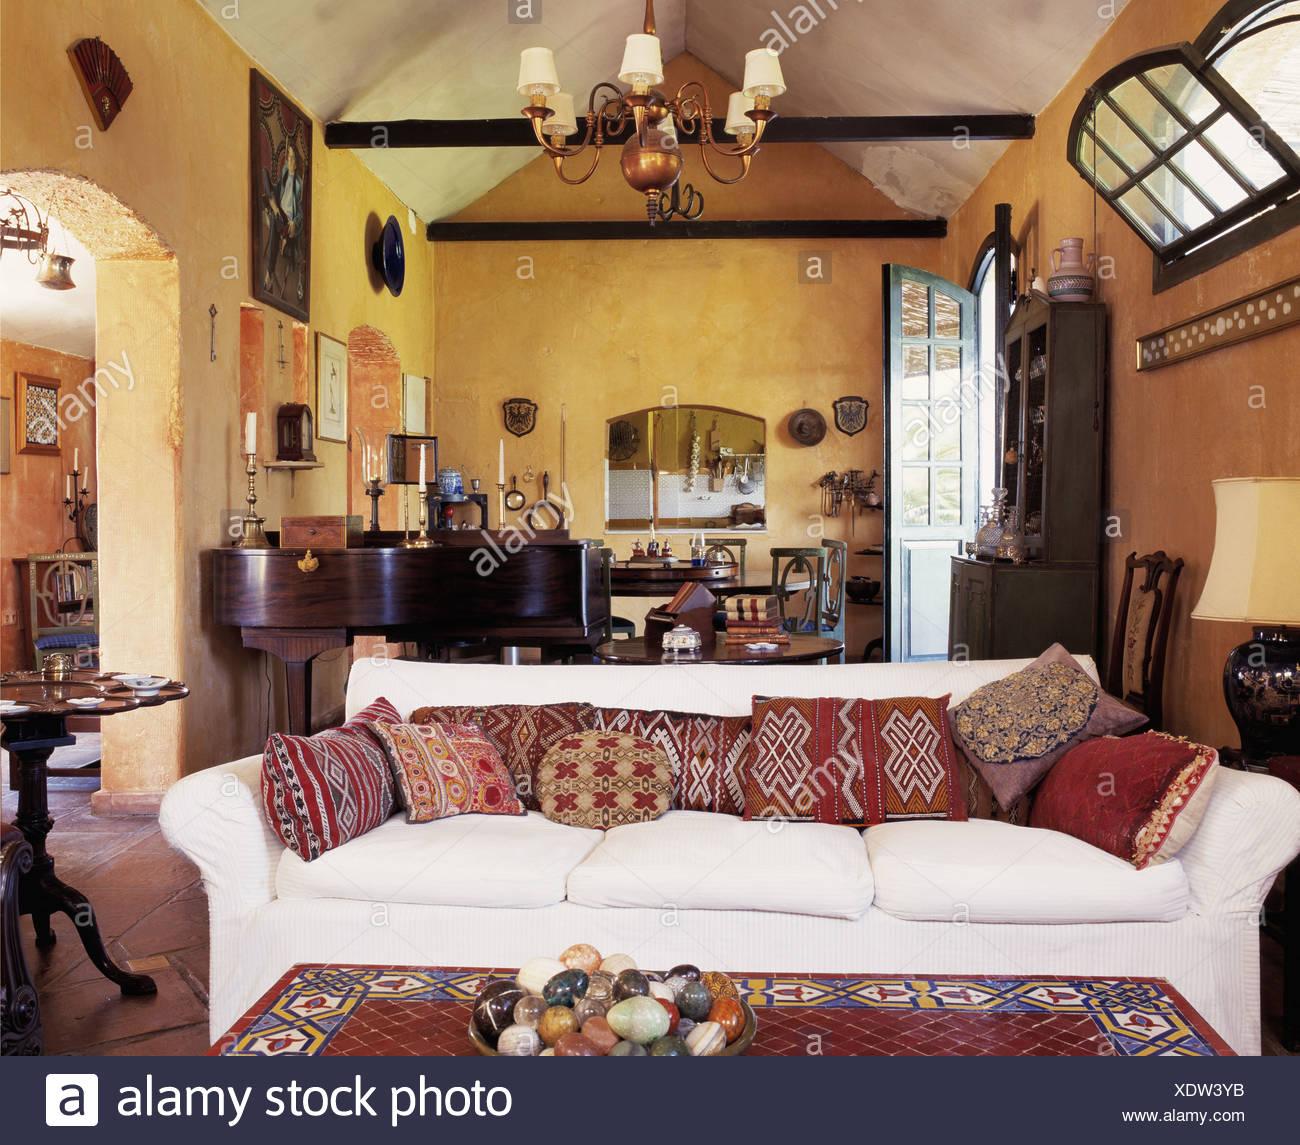 Kelim Cushions On White Sofa In Yellow Living Room In Spanish